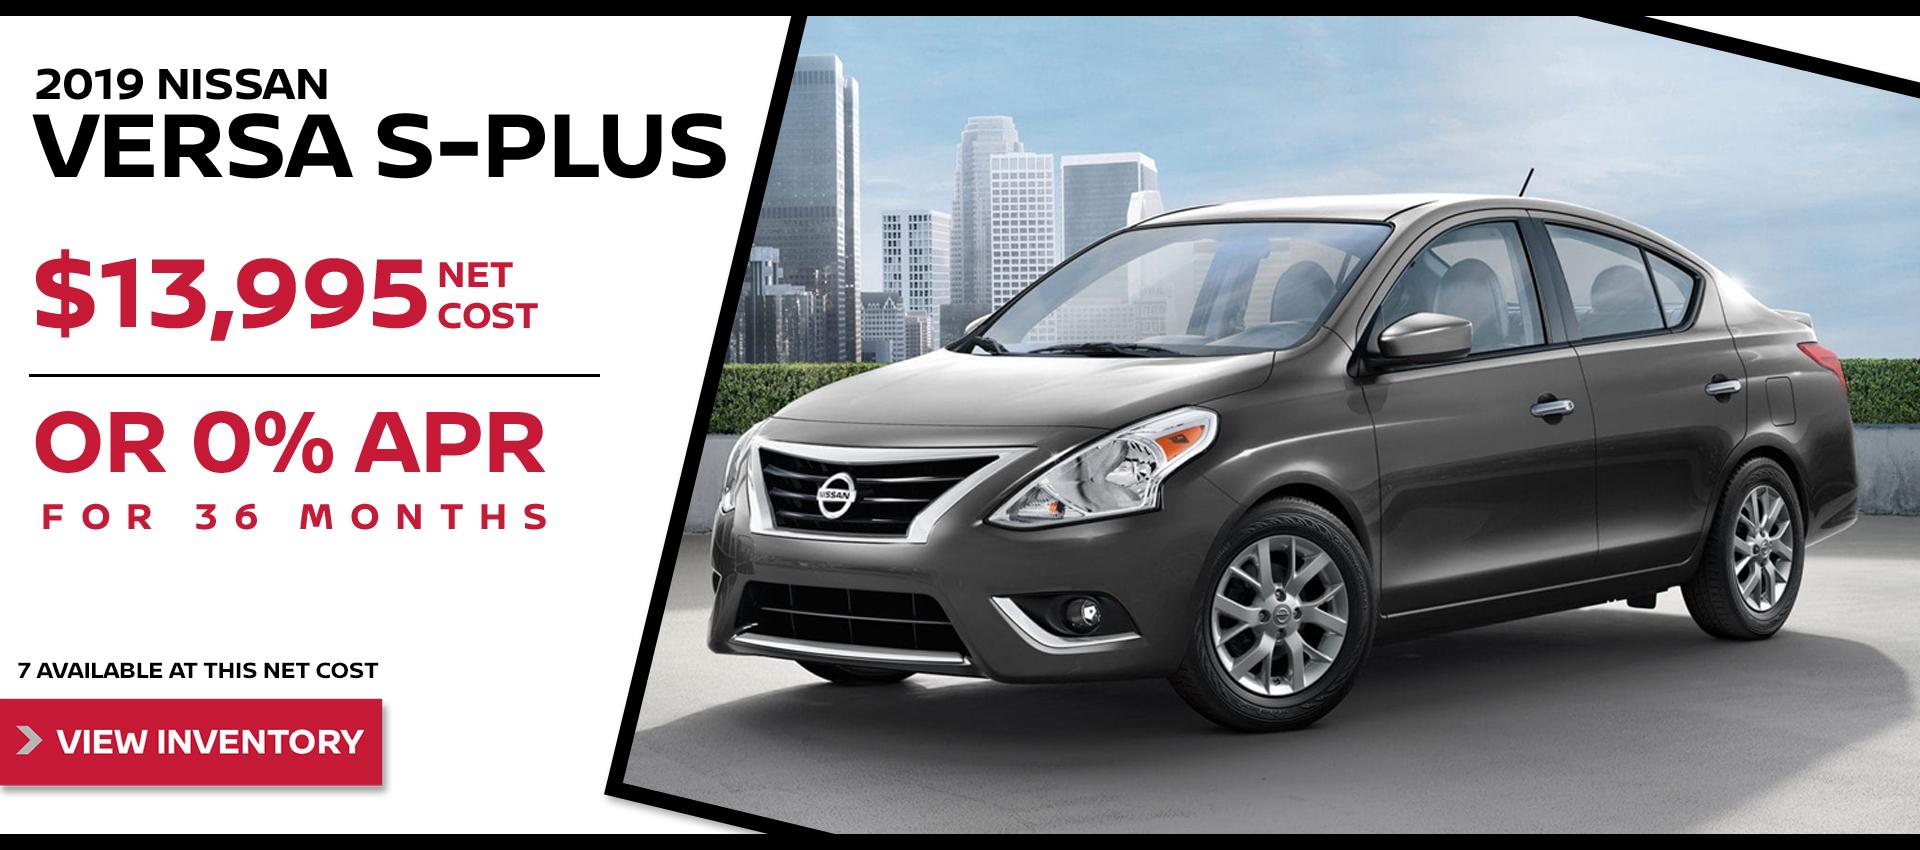 Mossy Nissan - Nissan Versa $13,995 Purchase HP